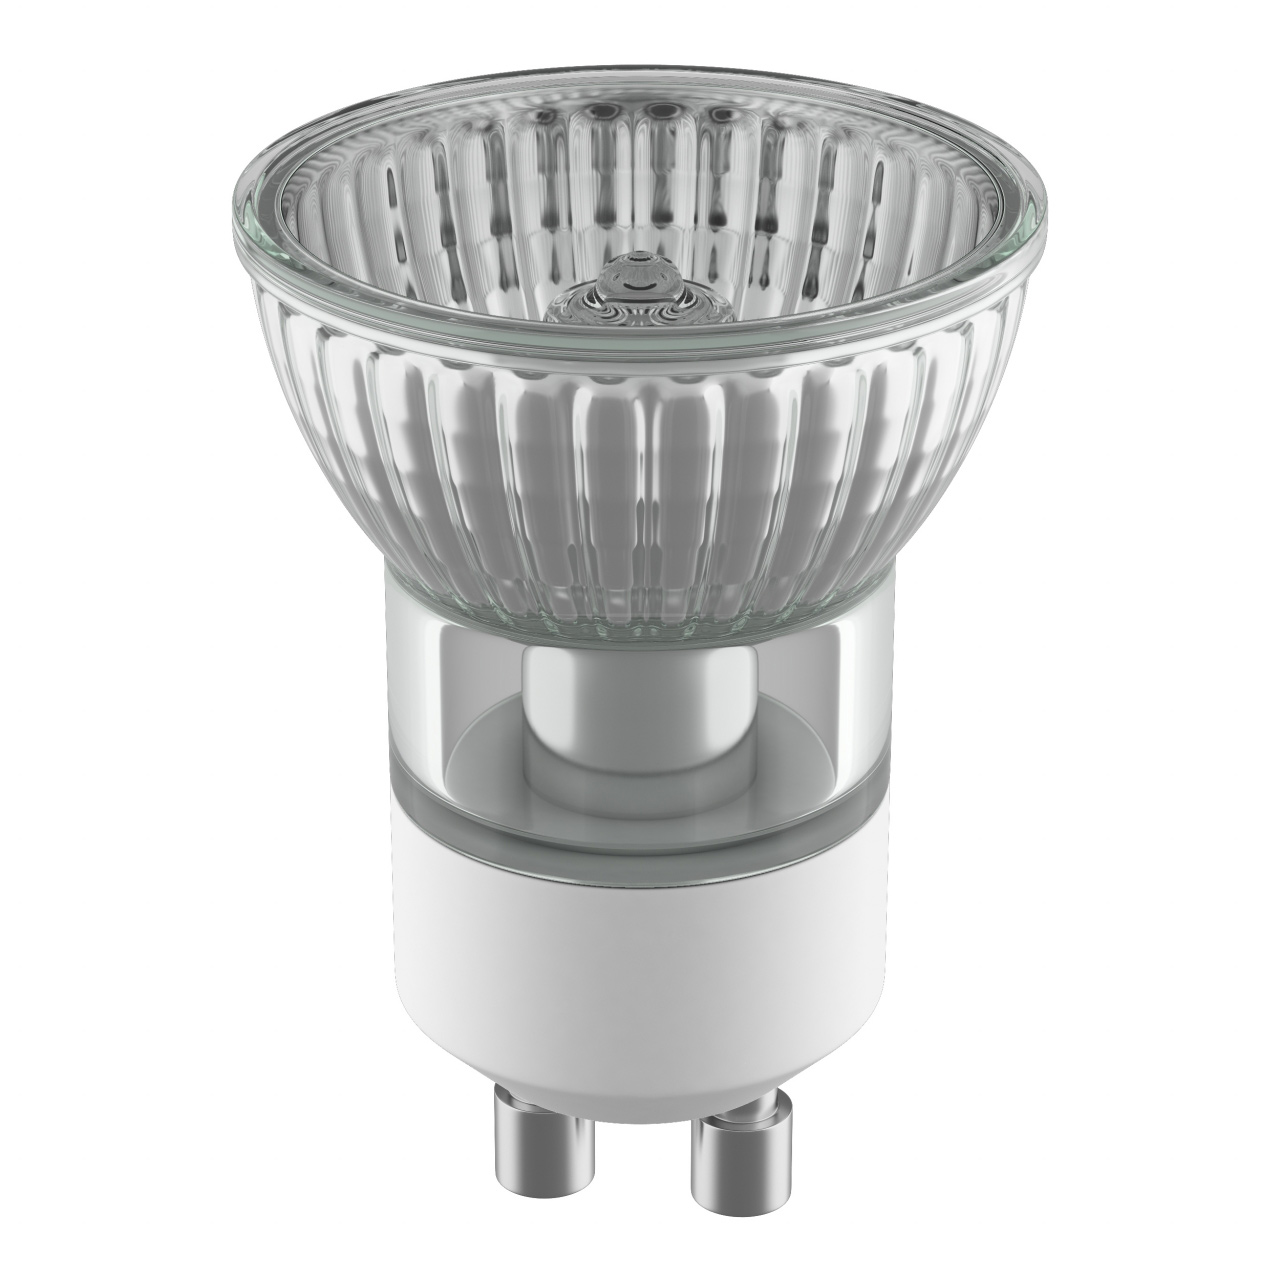 Лампа HAL 220V HP11 GU10 35W 30G ALU RA100 2800K 2000H DIMM Lightstar 922703